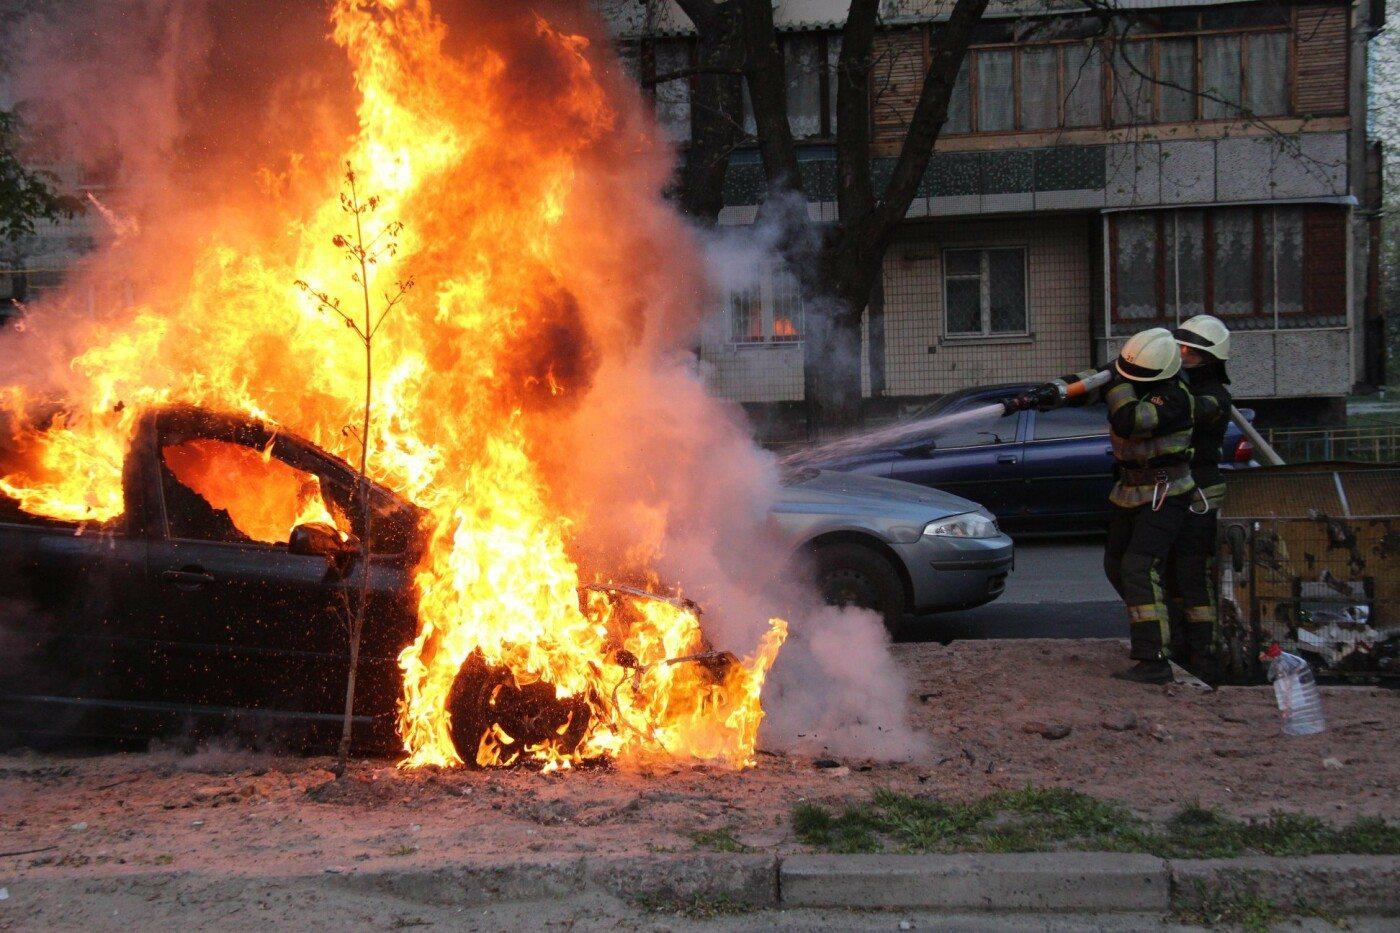 Суворовский район,пожар автомобиля,Херсон